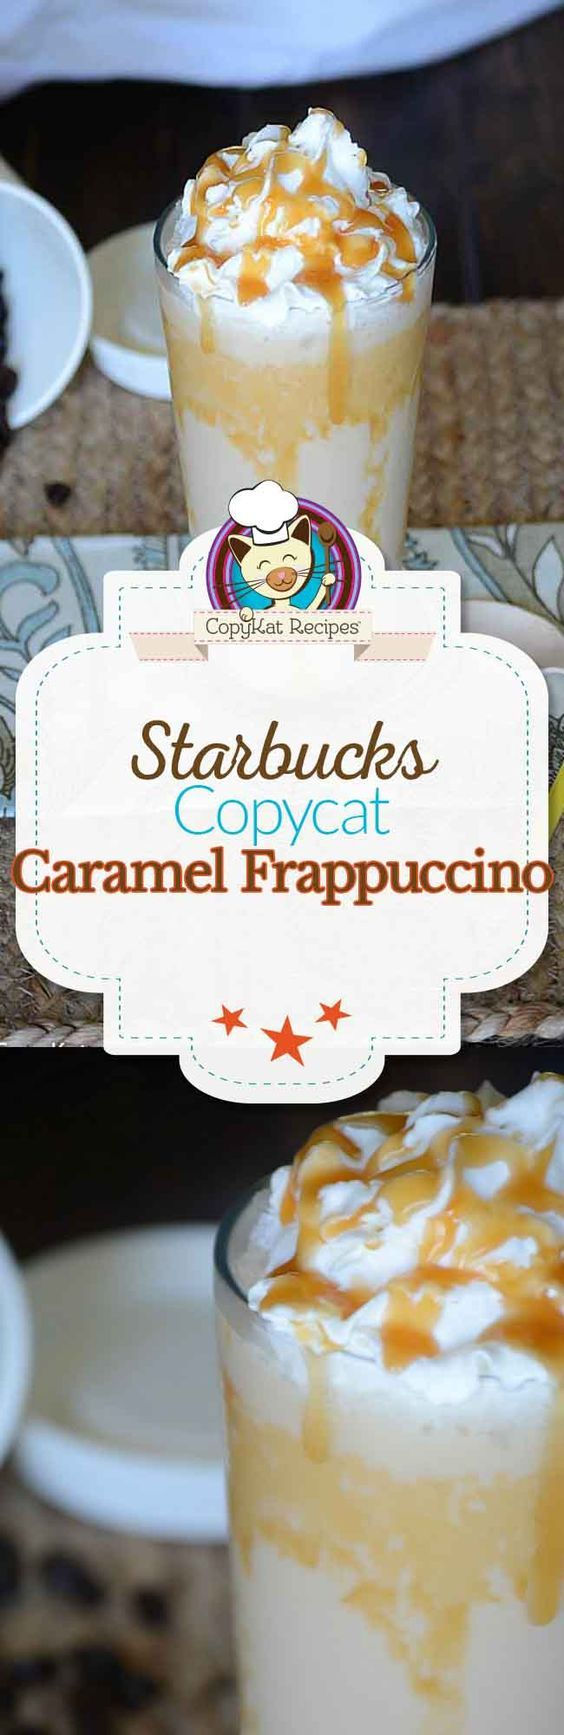 Starbucks Caramel Frappuccino Copycat Recipe Caramel